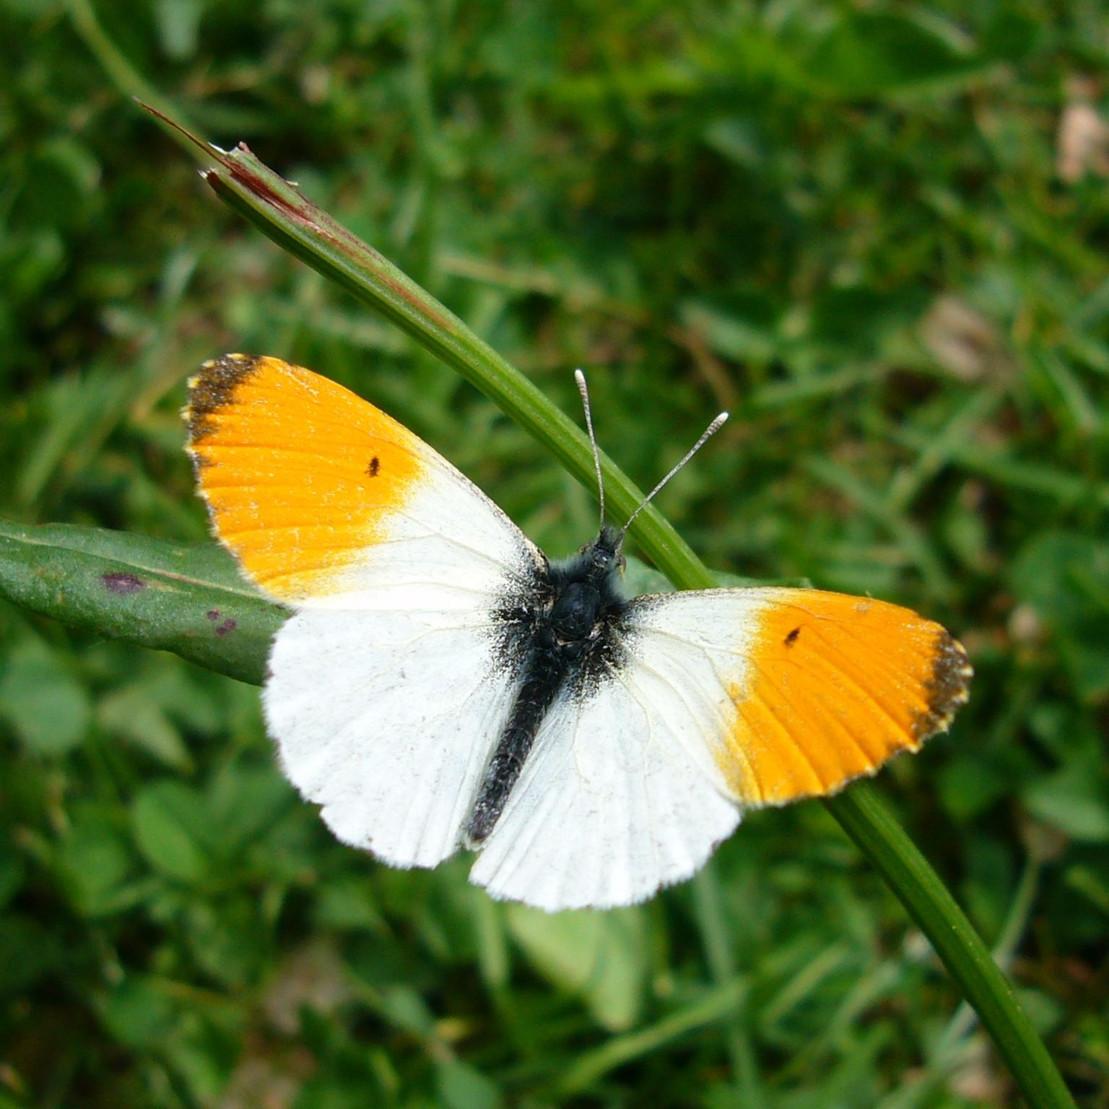 Bedrohte Schmetterlingsart: Aurorafalter